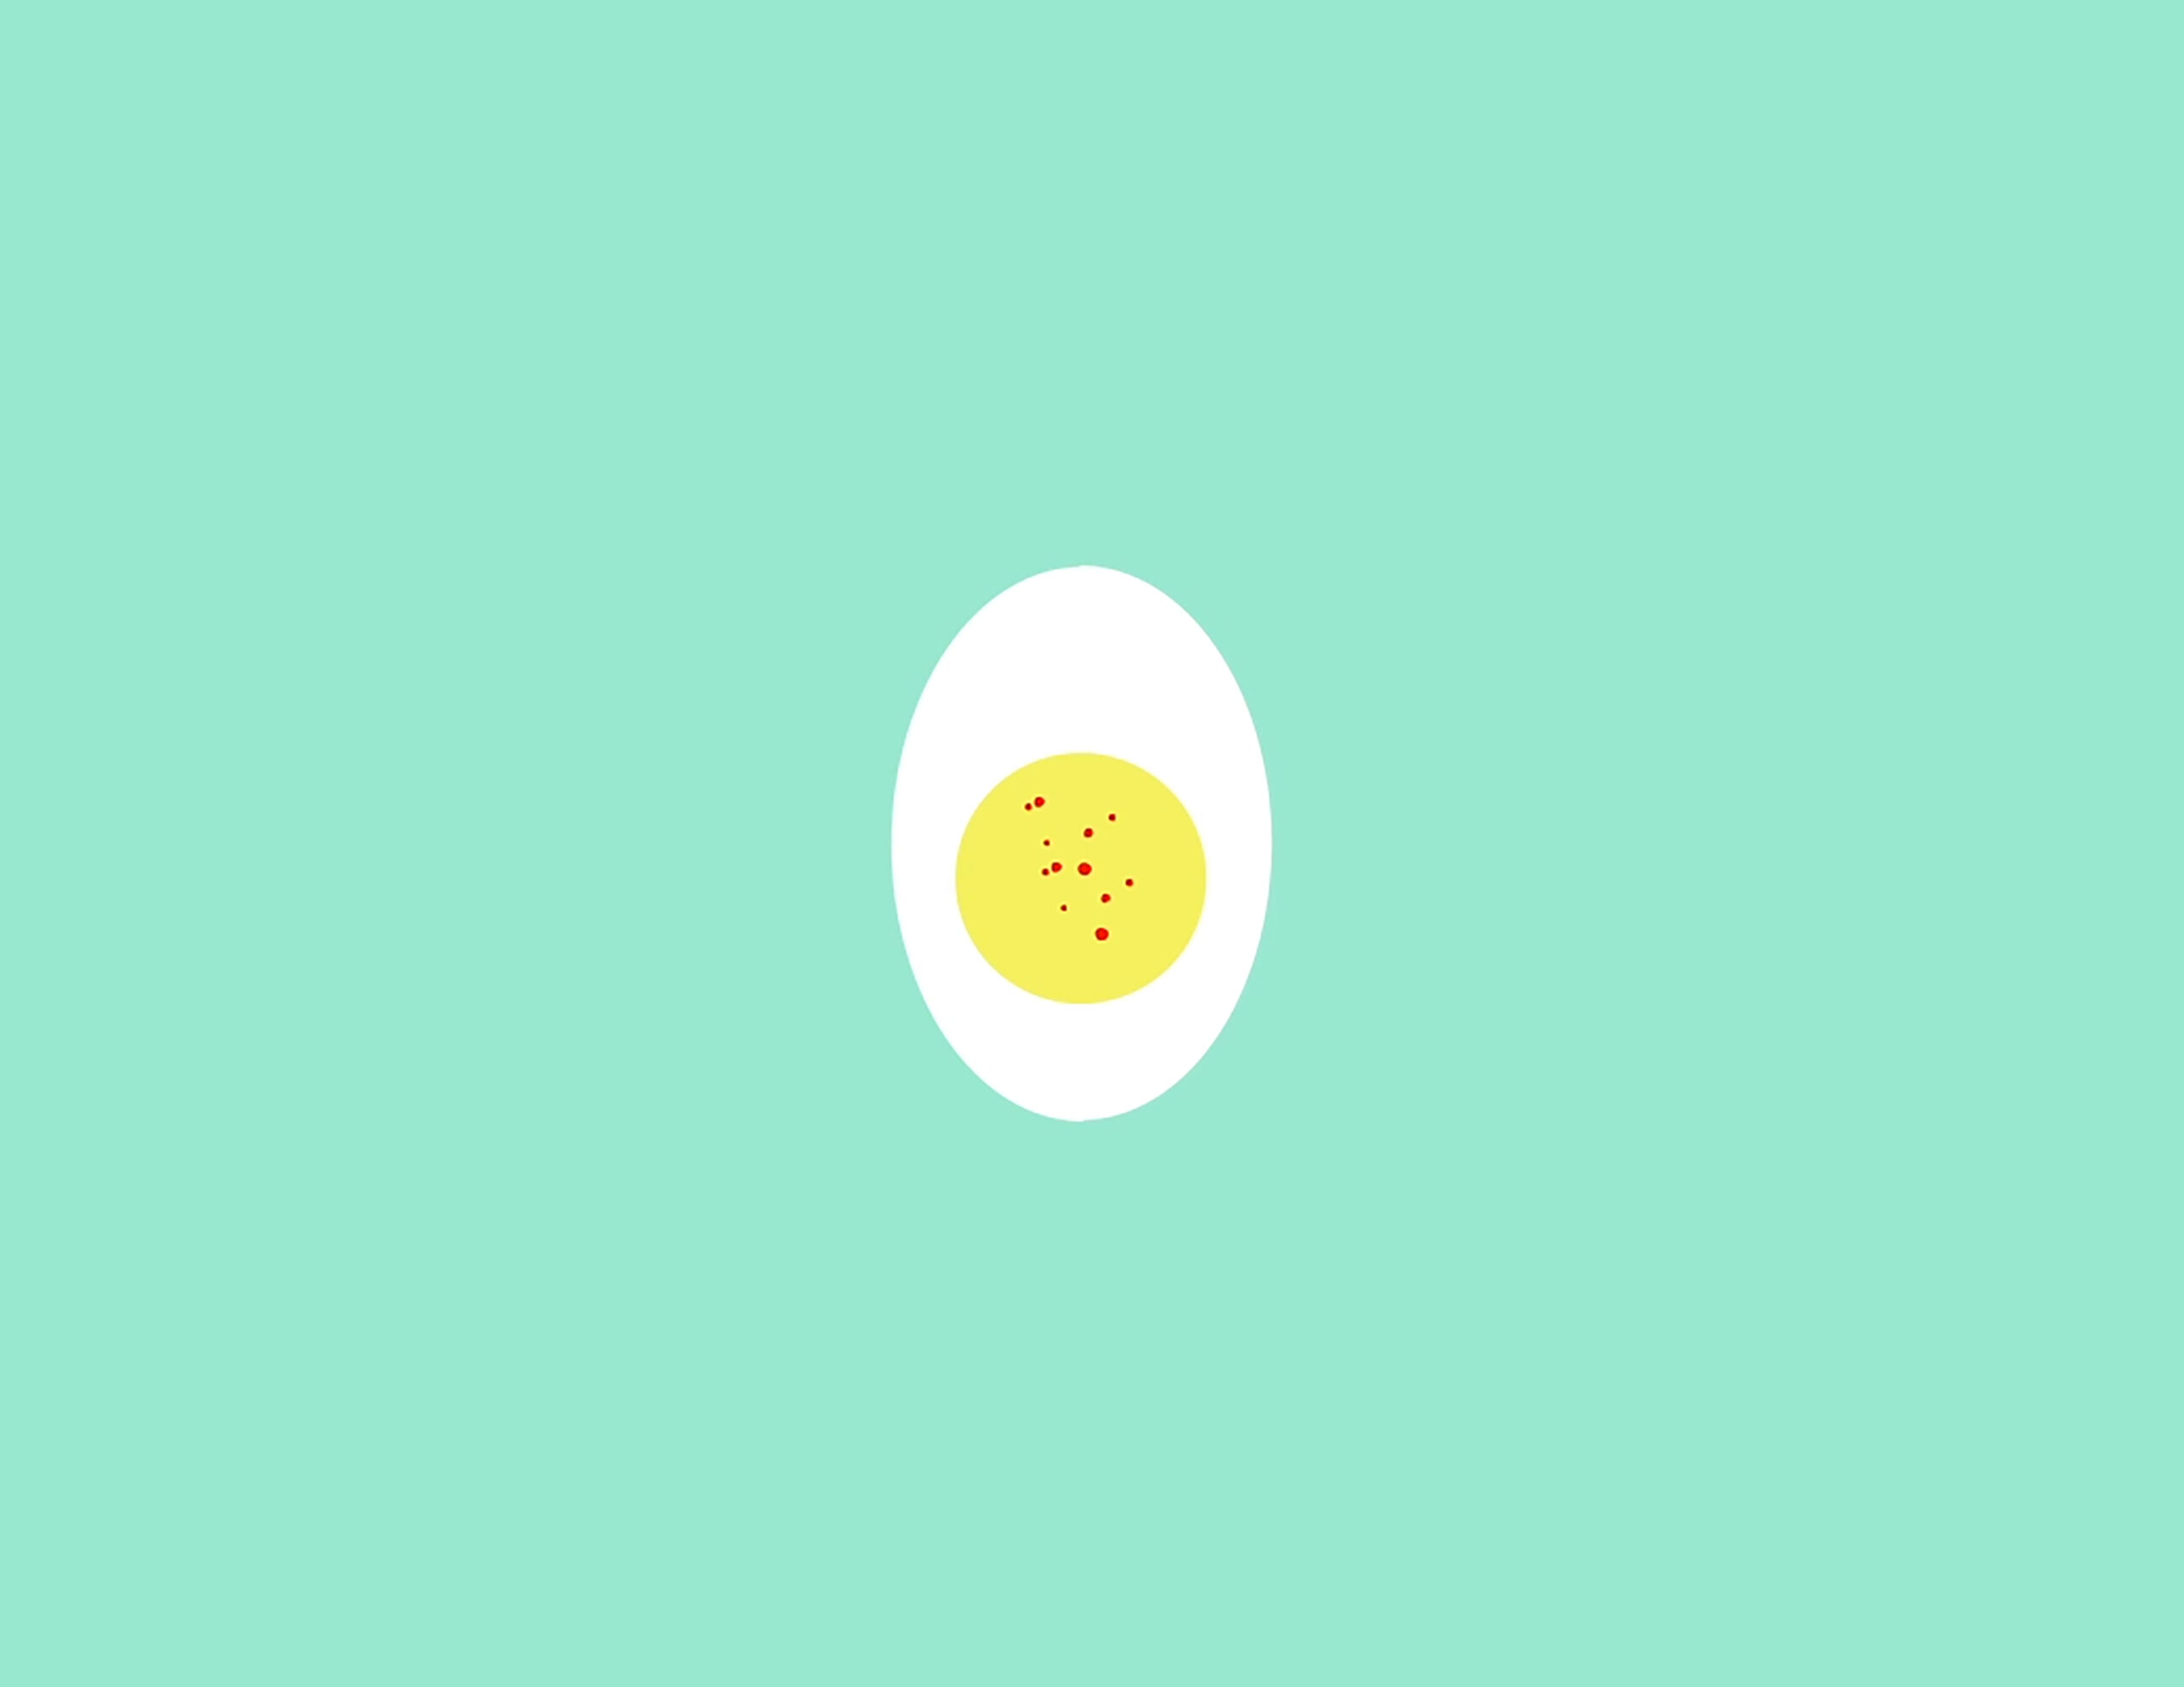 eggsite.fun